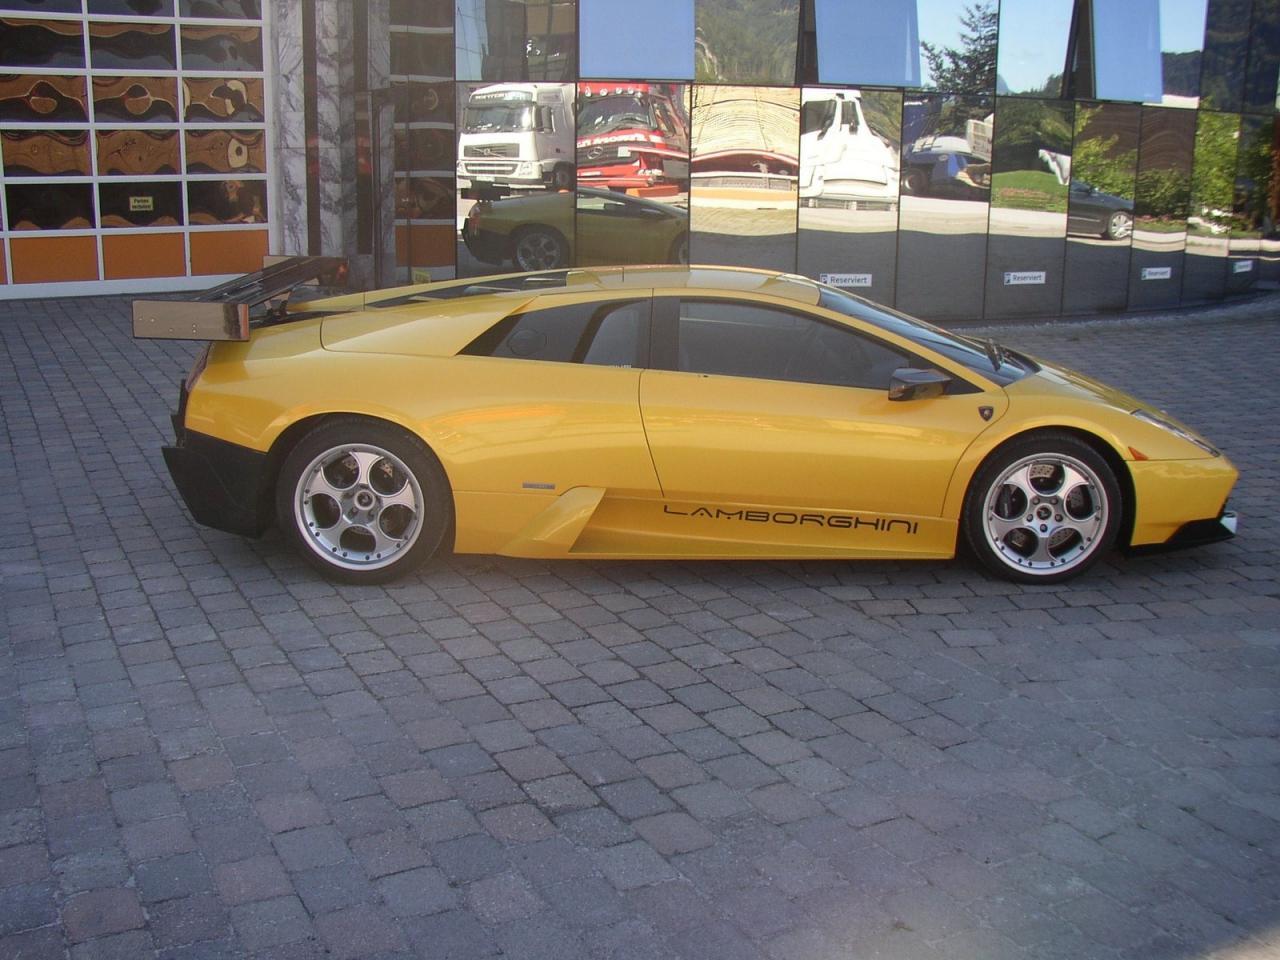 Auto Car Tuning Styling Lamborghini Murcielago Sv Body Kit By Dmc